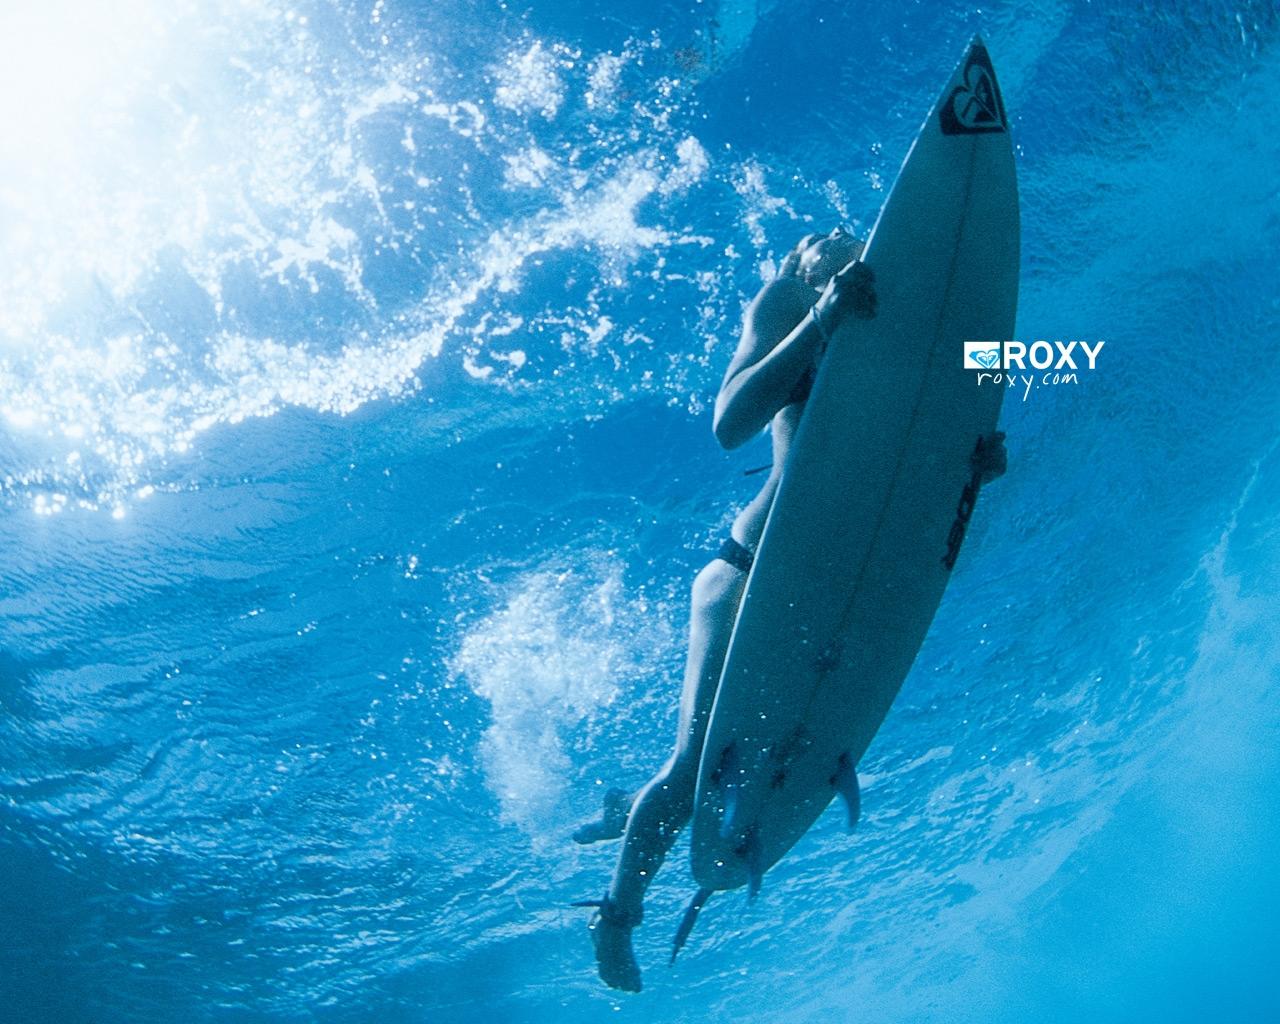 Surfing Duck Dive Roxy Surf Wallpaper 1280x1024 Full HD Wallpapers 1280x1024